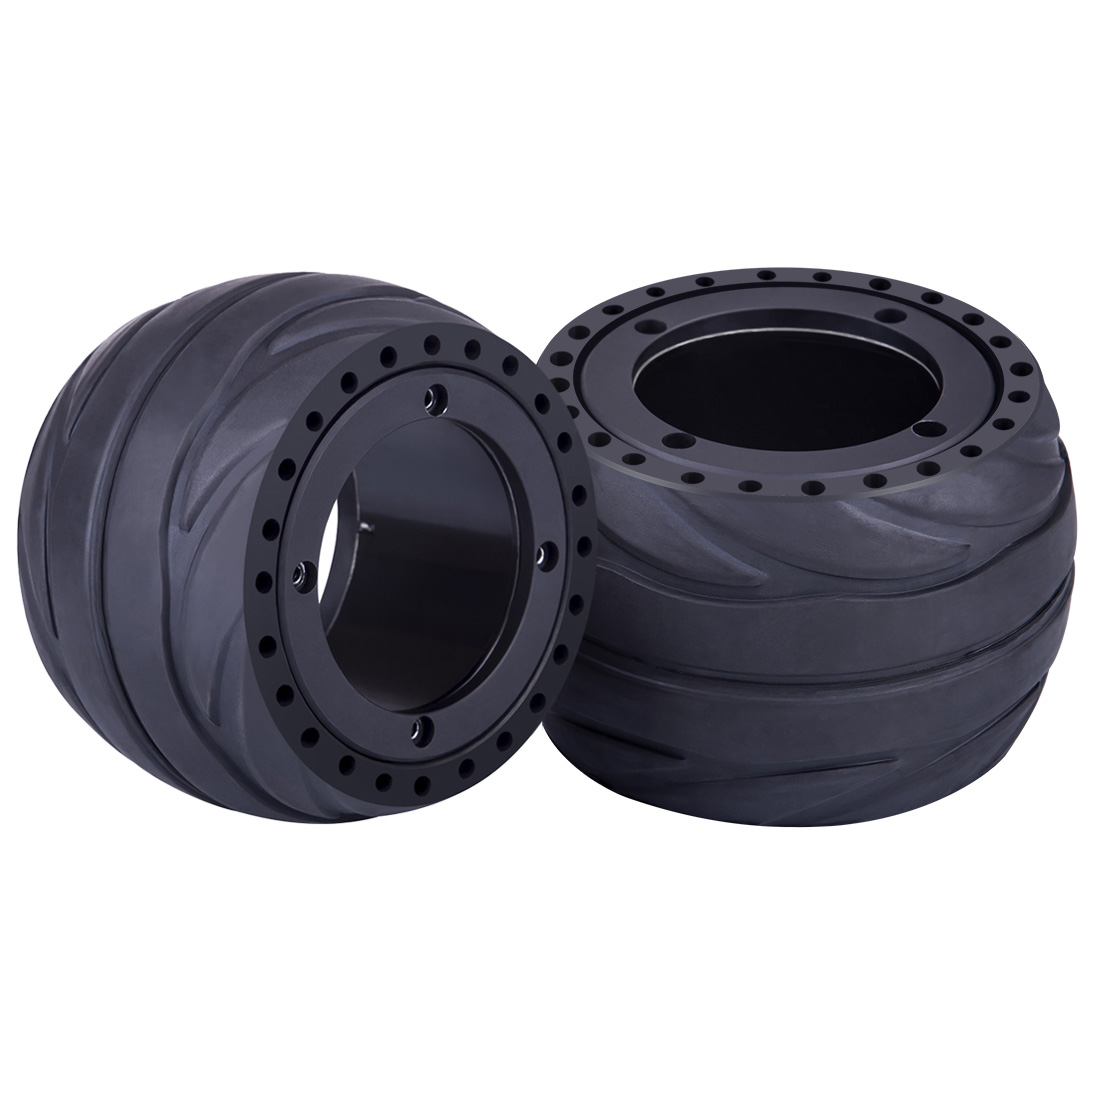 2Pcs 105 X 66mm Hub Motor Rubber Tire Wheel